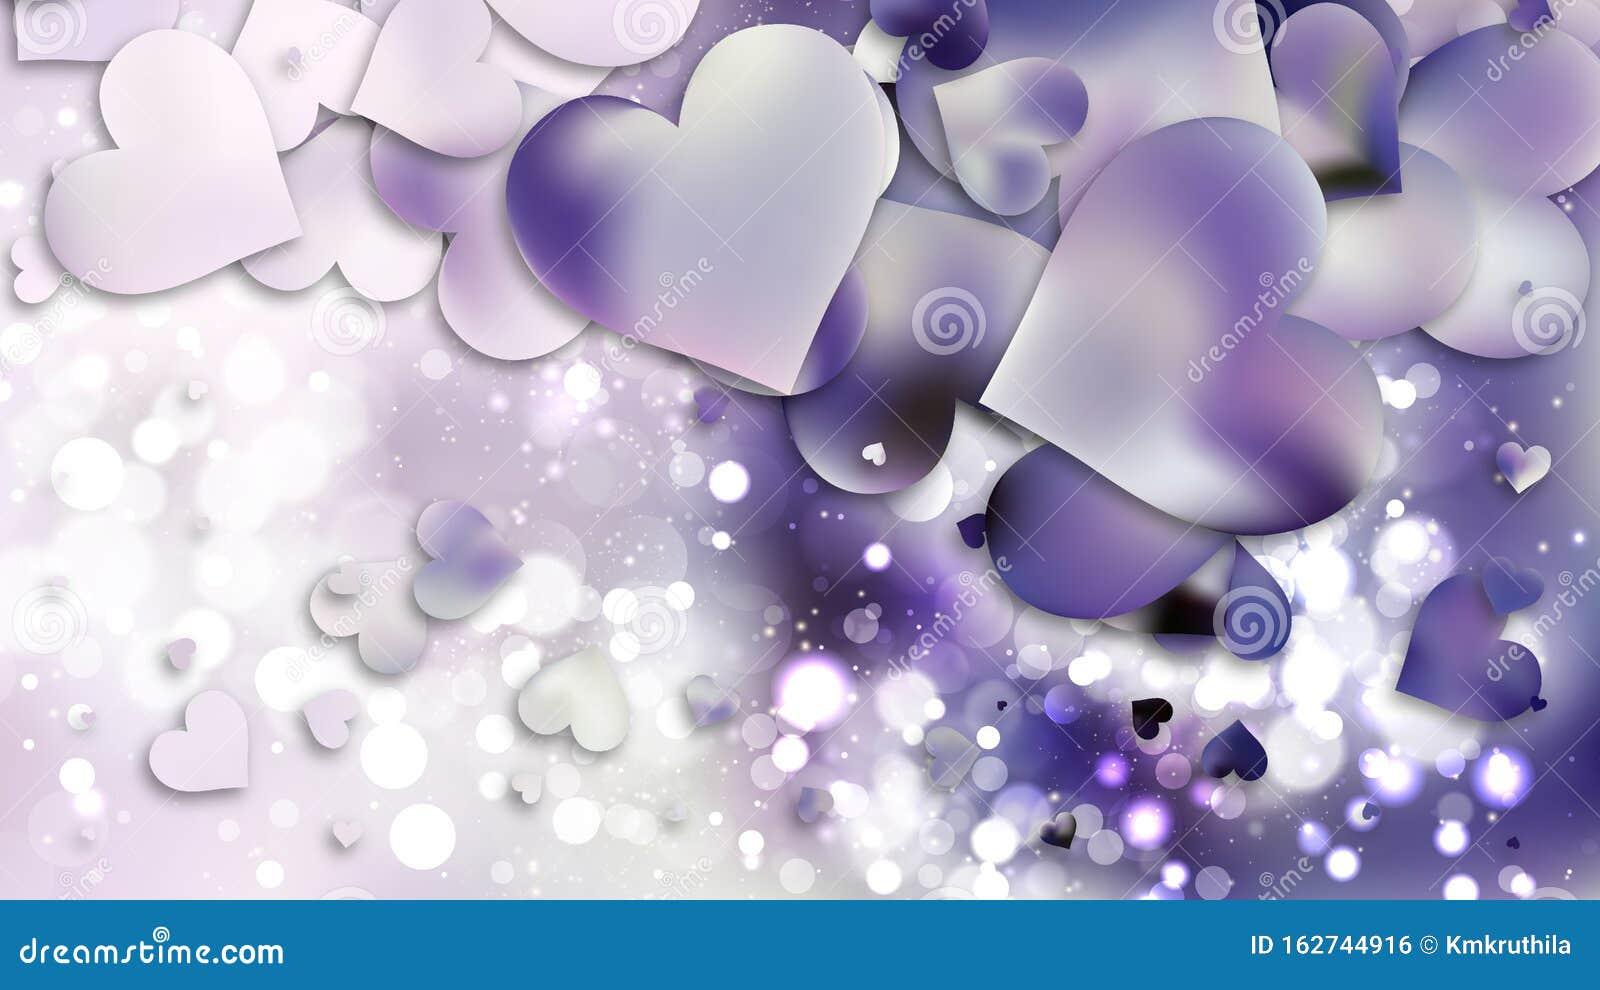 light purple heart wallpaper background illustration 162744916